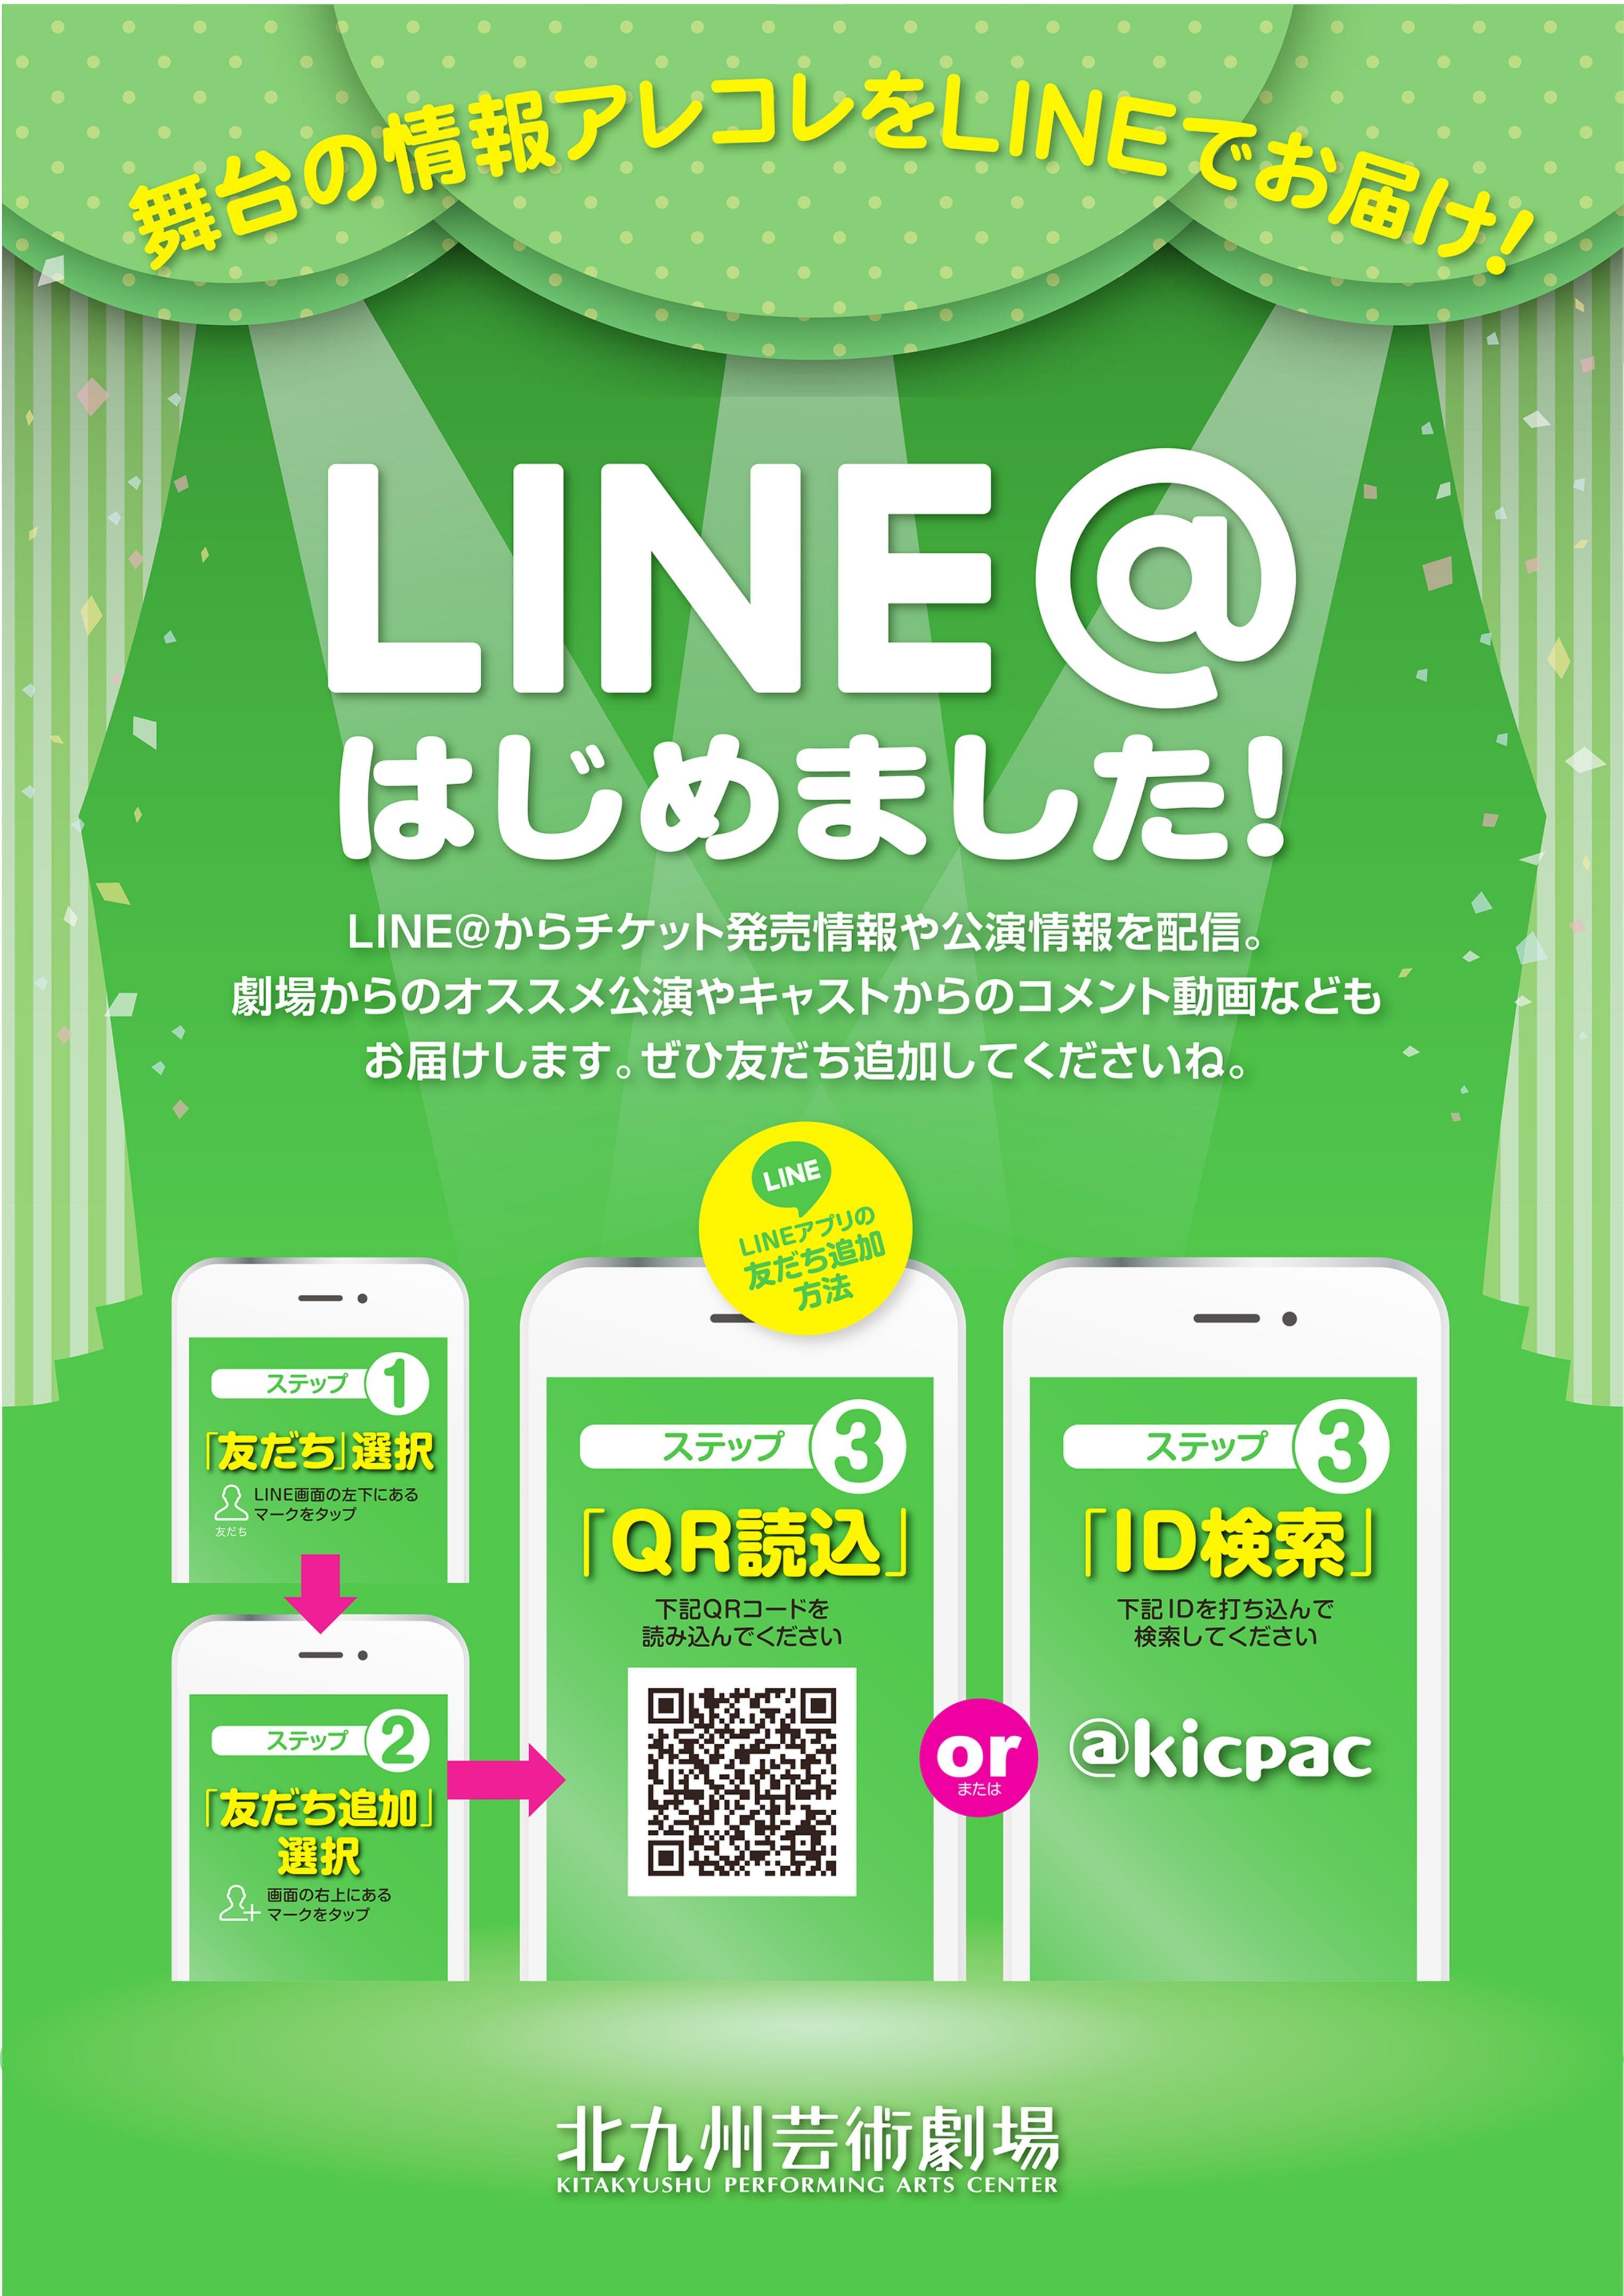 linekokuchi.jpg